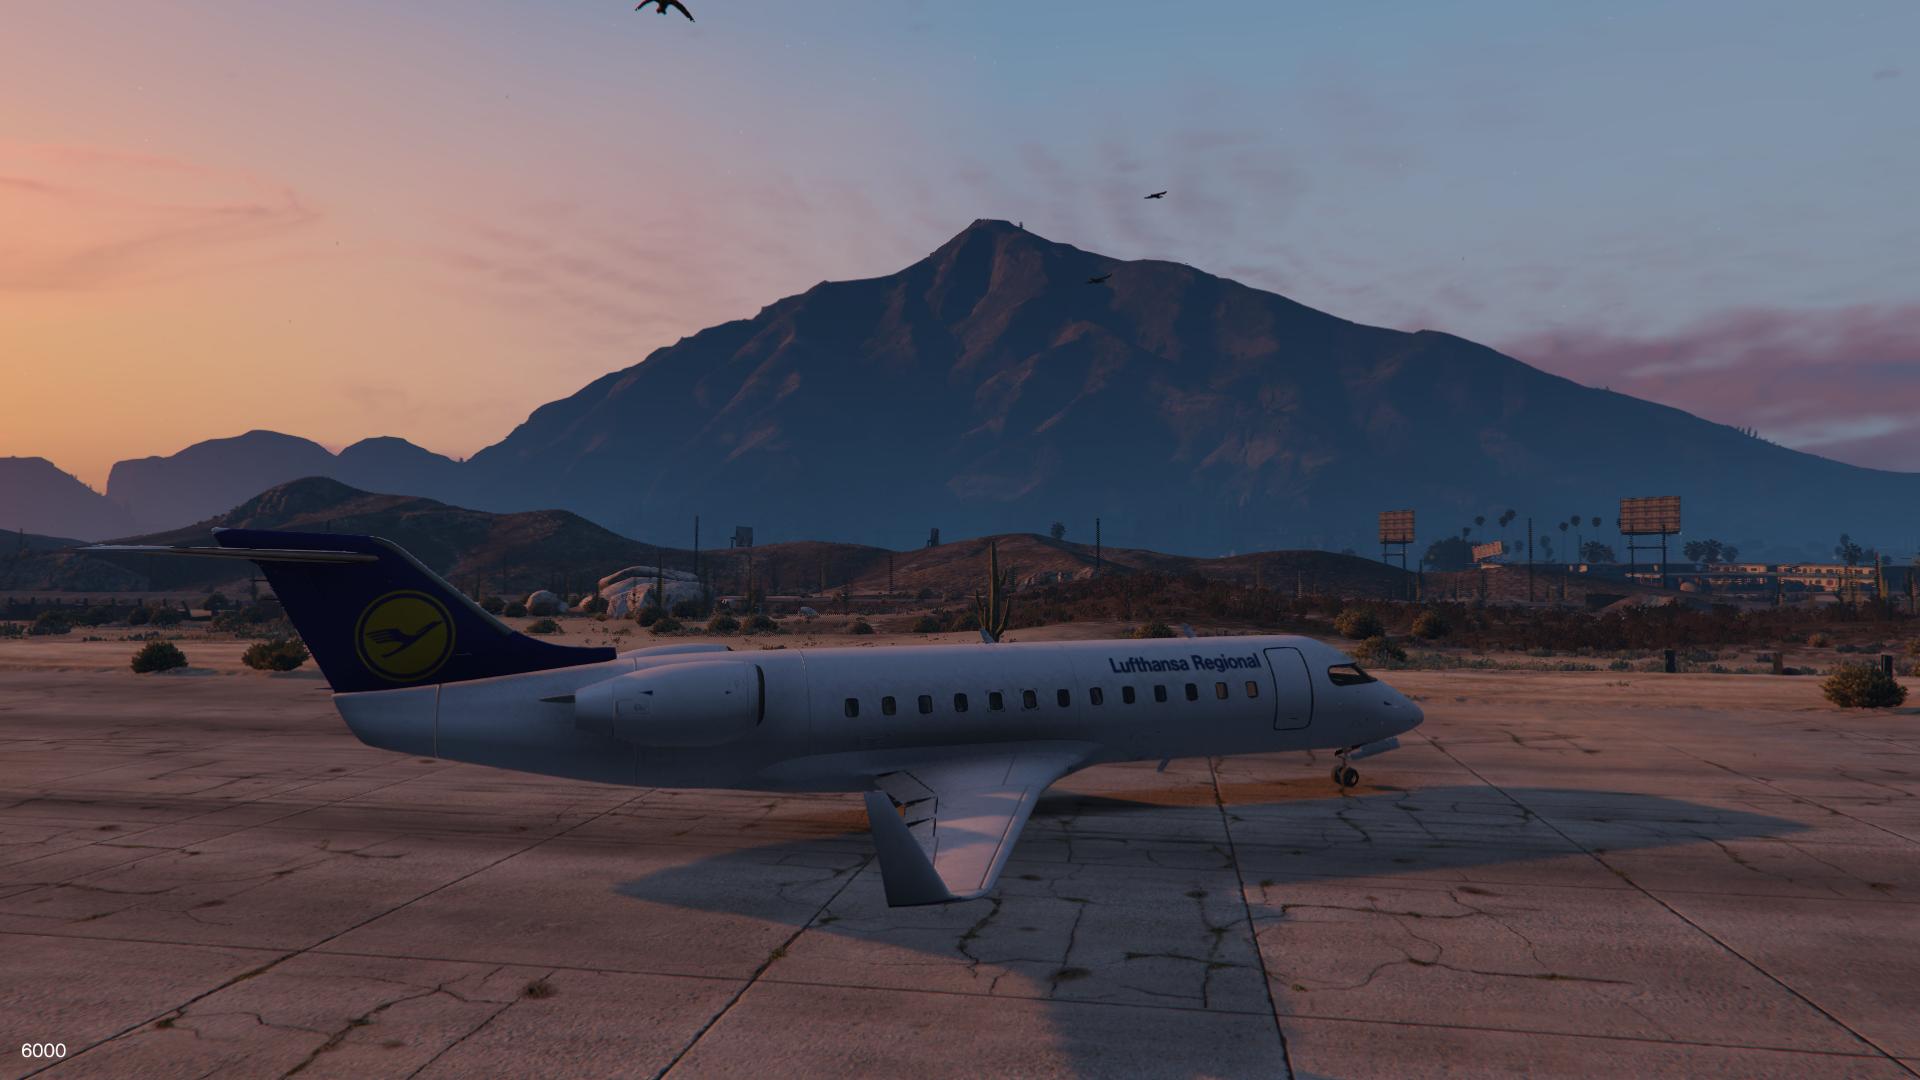 Обои Lufthansa. Авиация